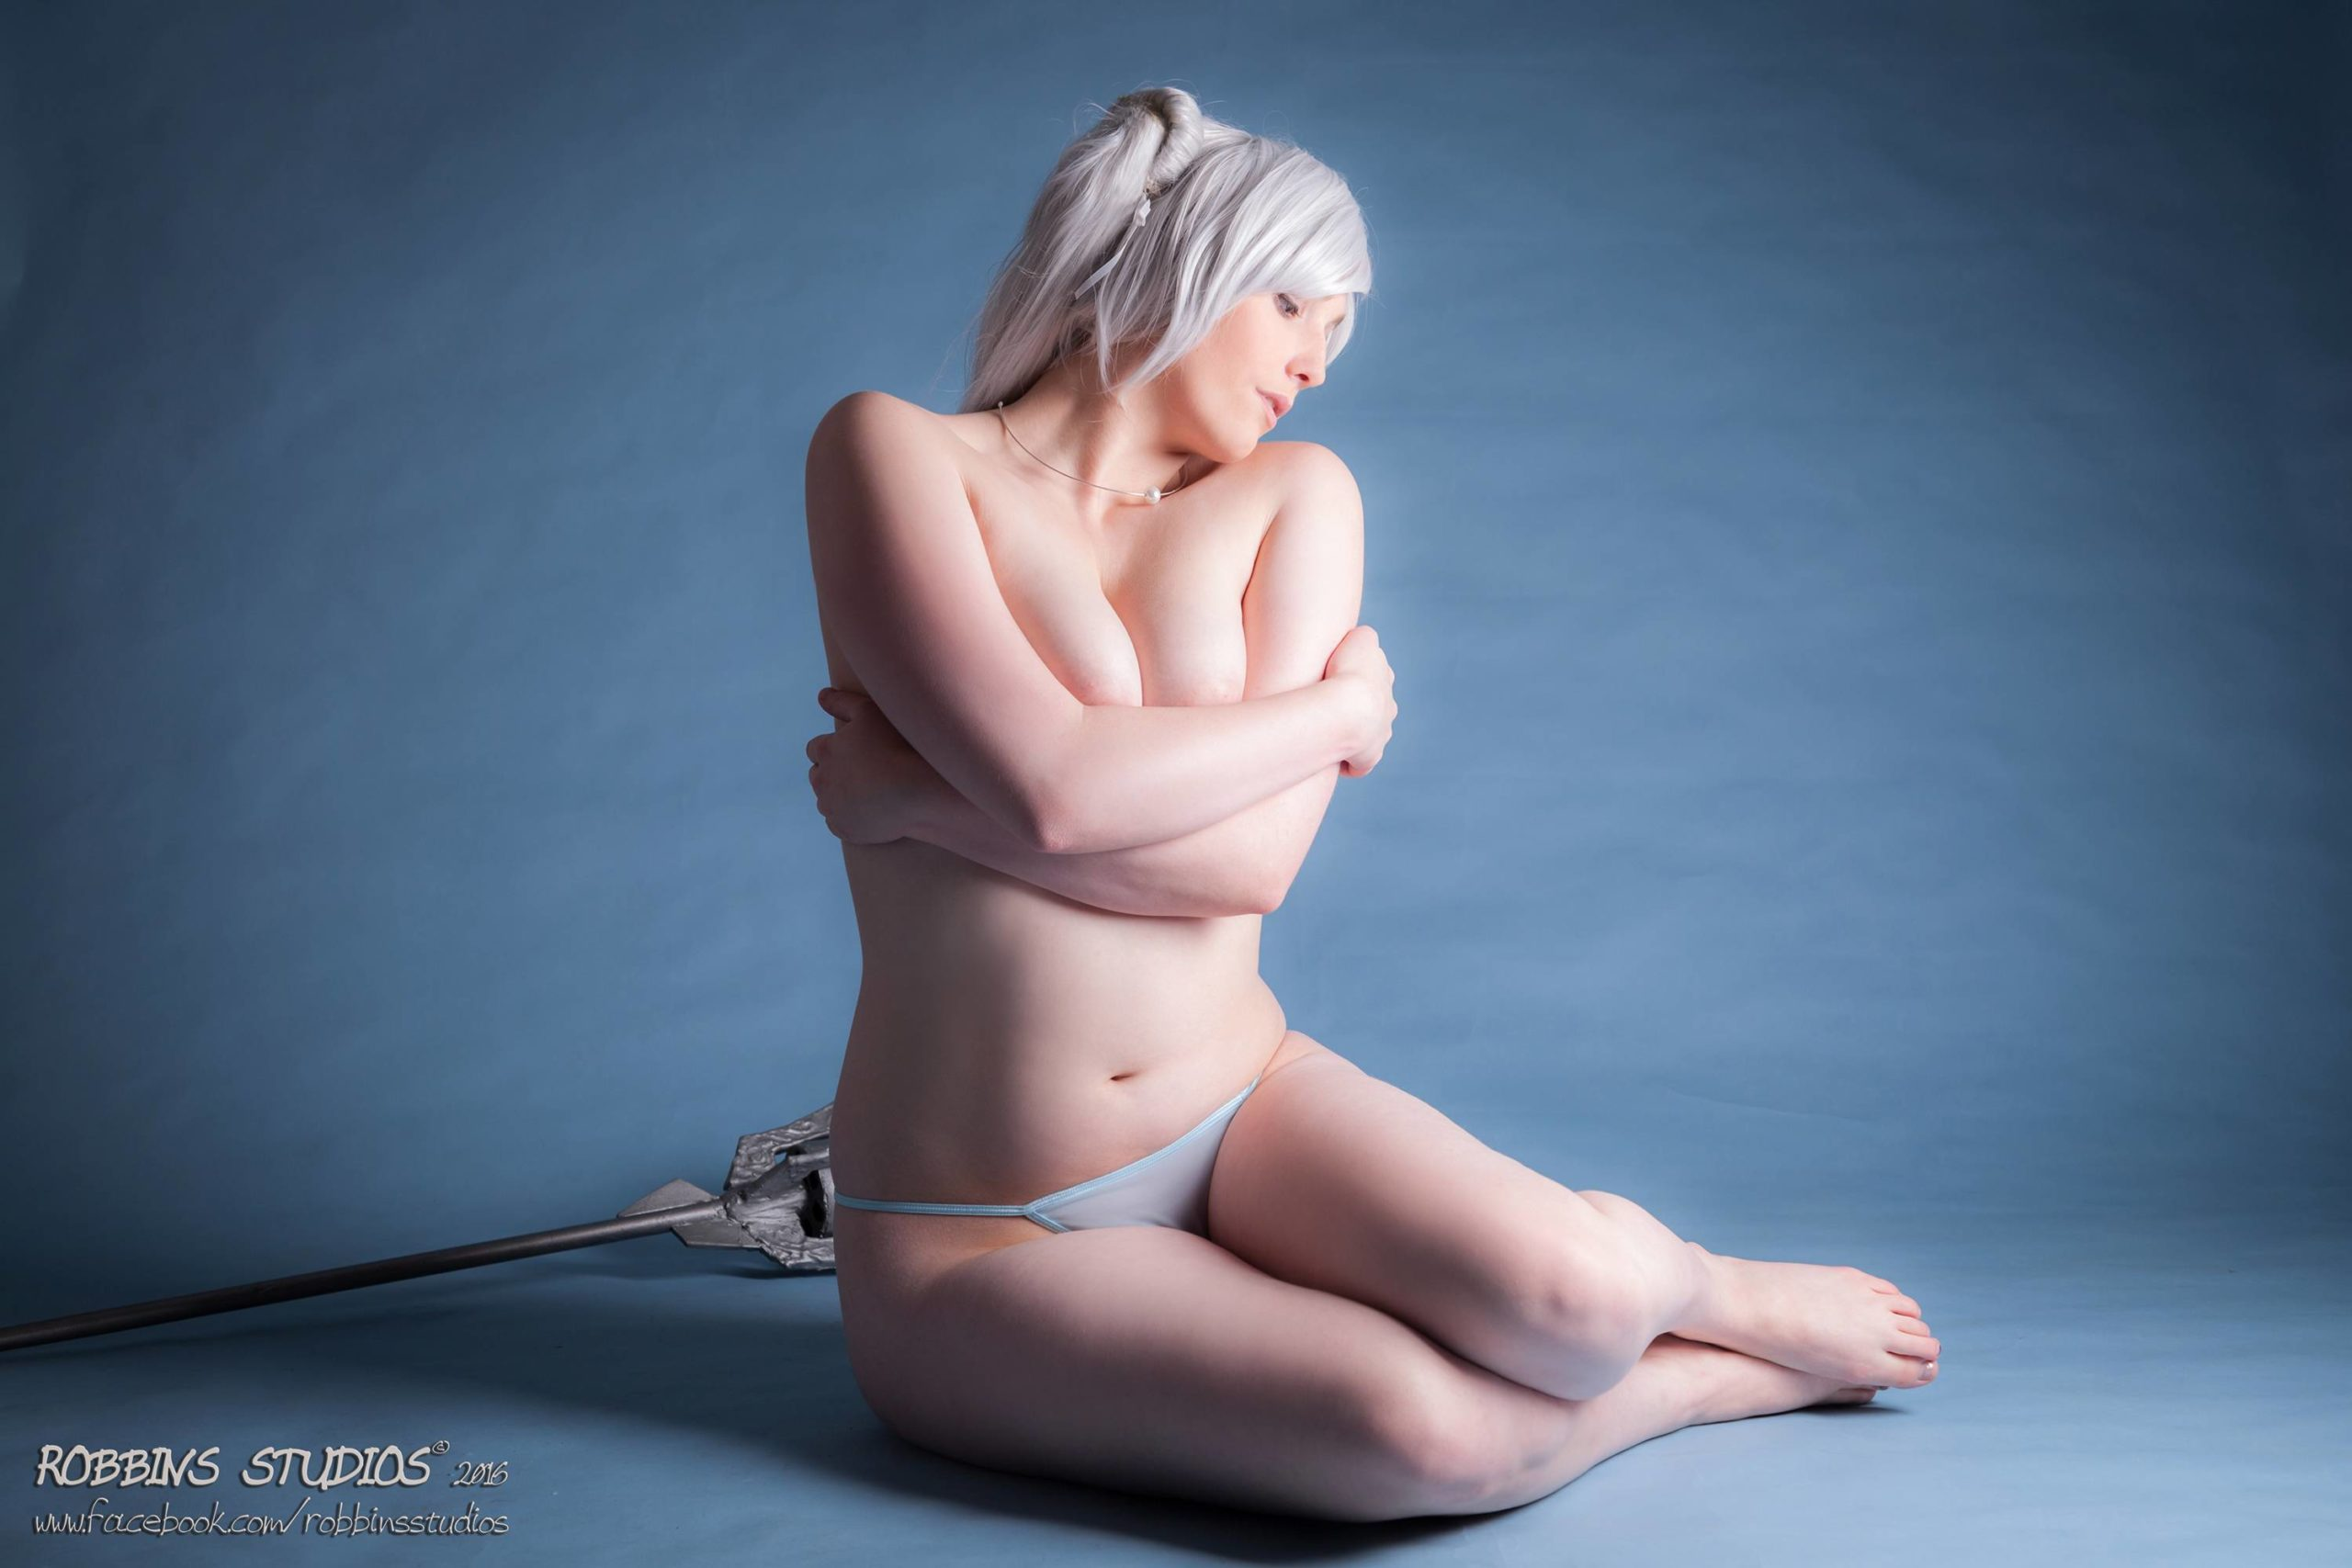 Microkitty Patreon Nude Photos Leaks 0008